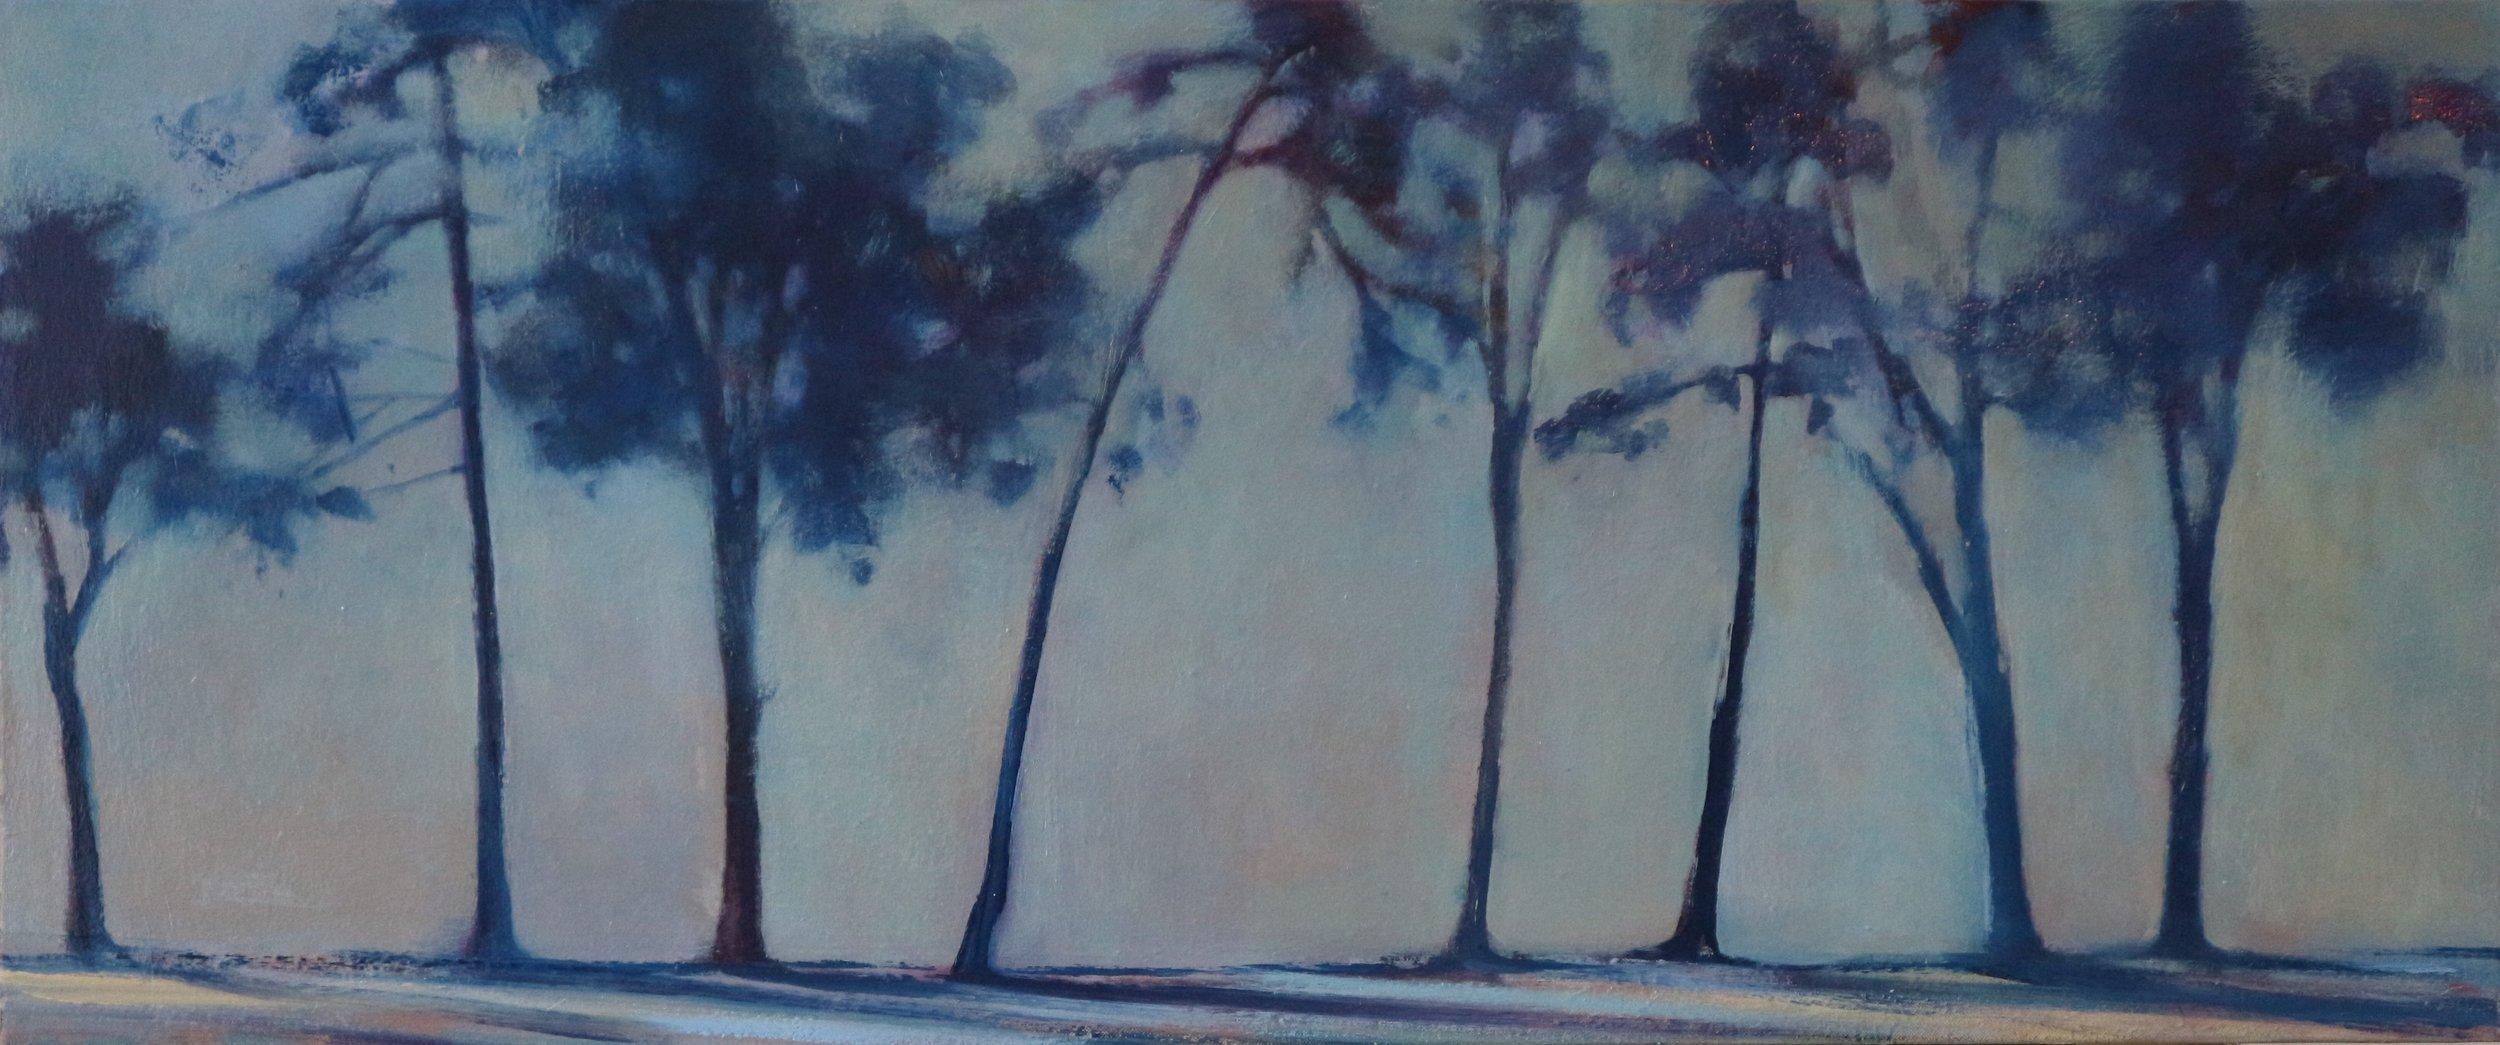 Title: Distant Treeline (I)  Size: 50 x 100 cm  Medium: Oil on canvas  Price: £1550